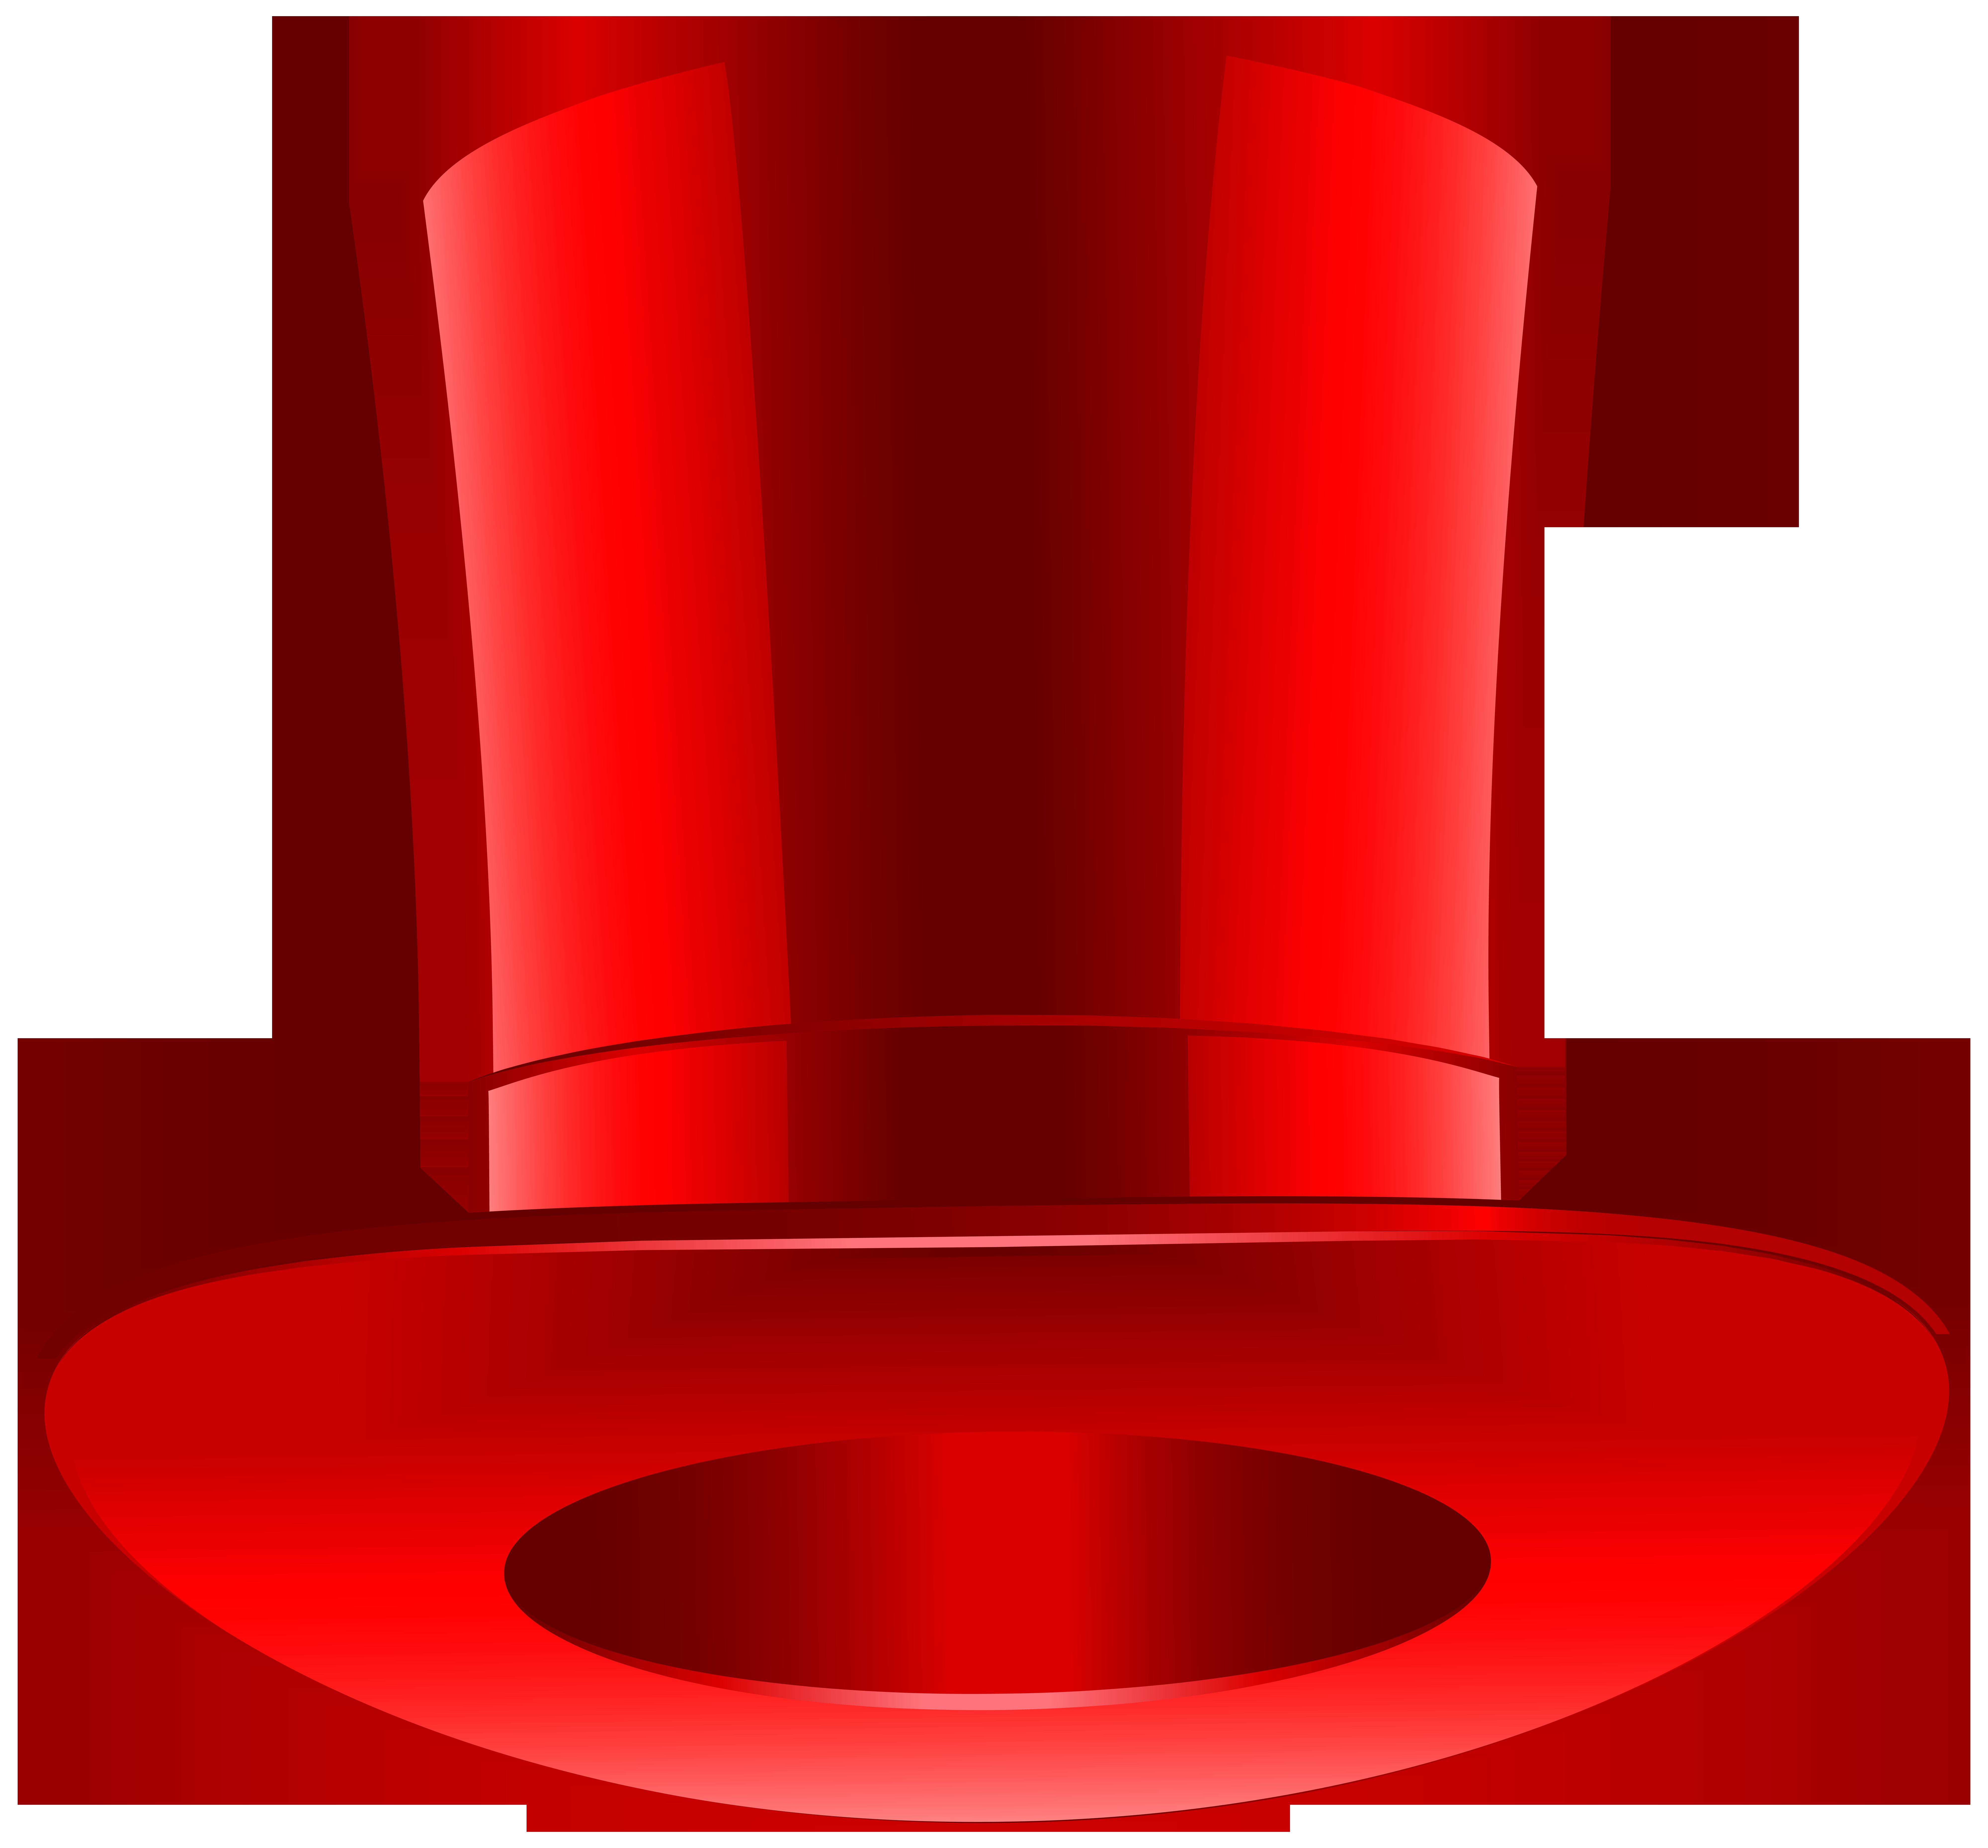 Top hat money clipart clipart Red Top Hat PNG Clip Art - Best WEB Clipart clipart